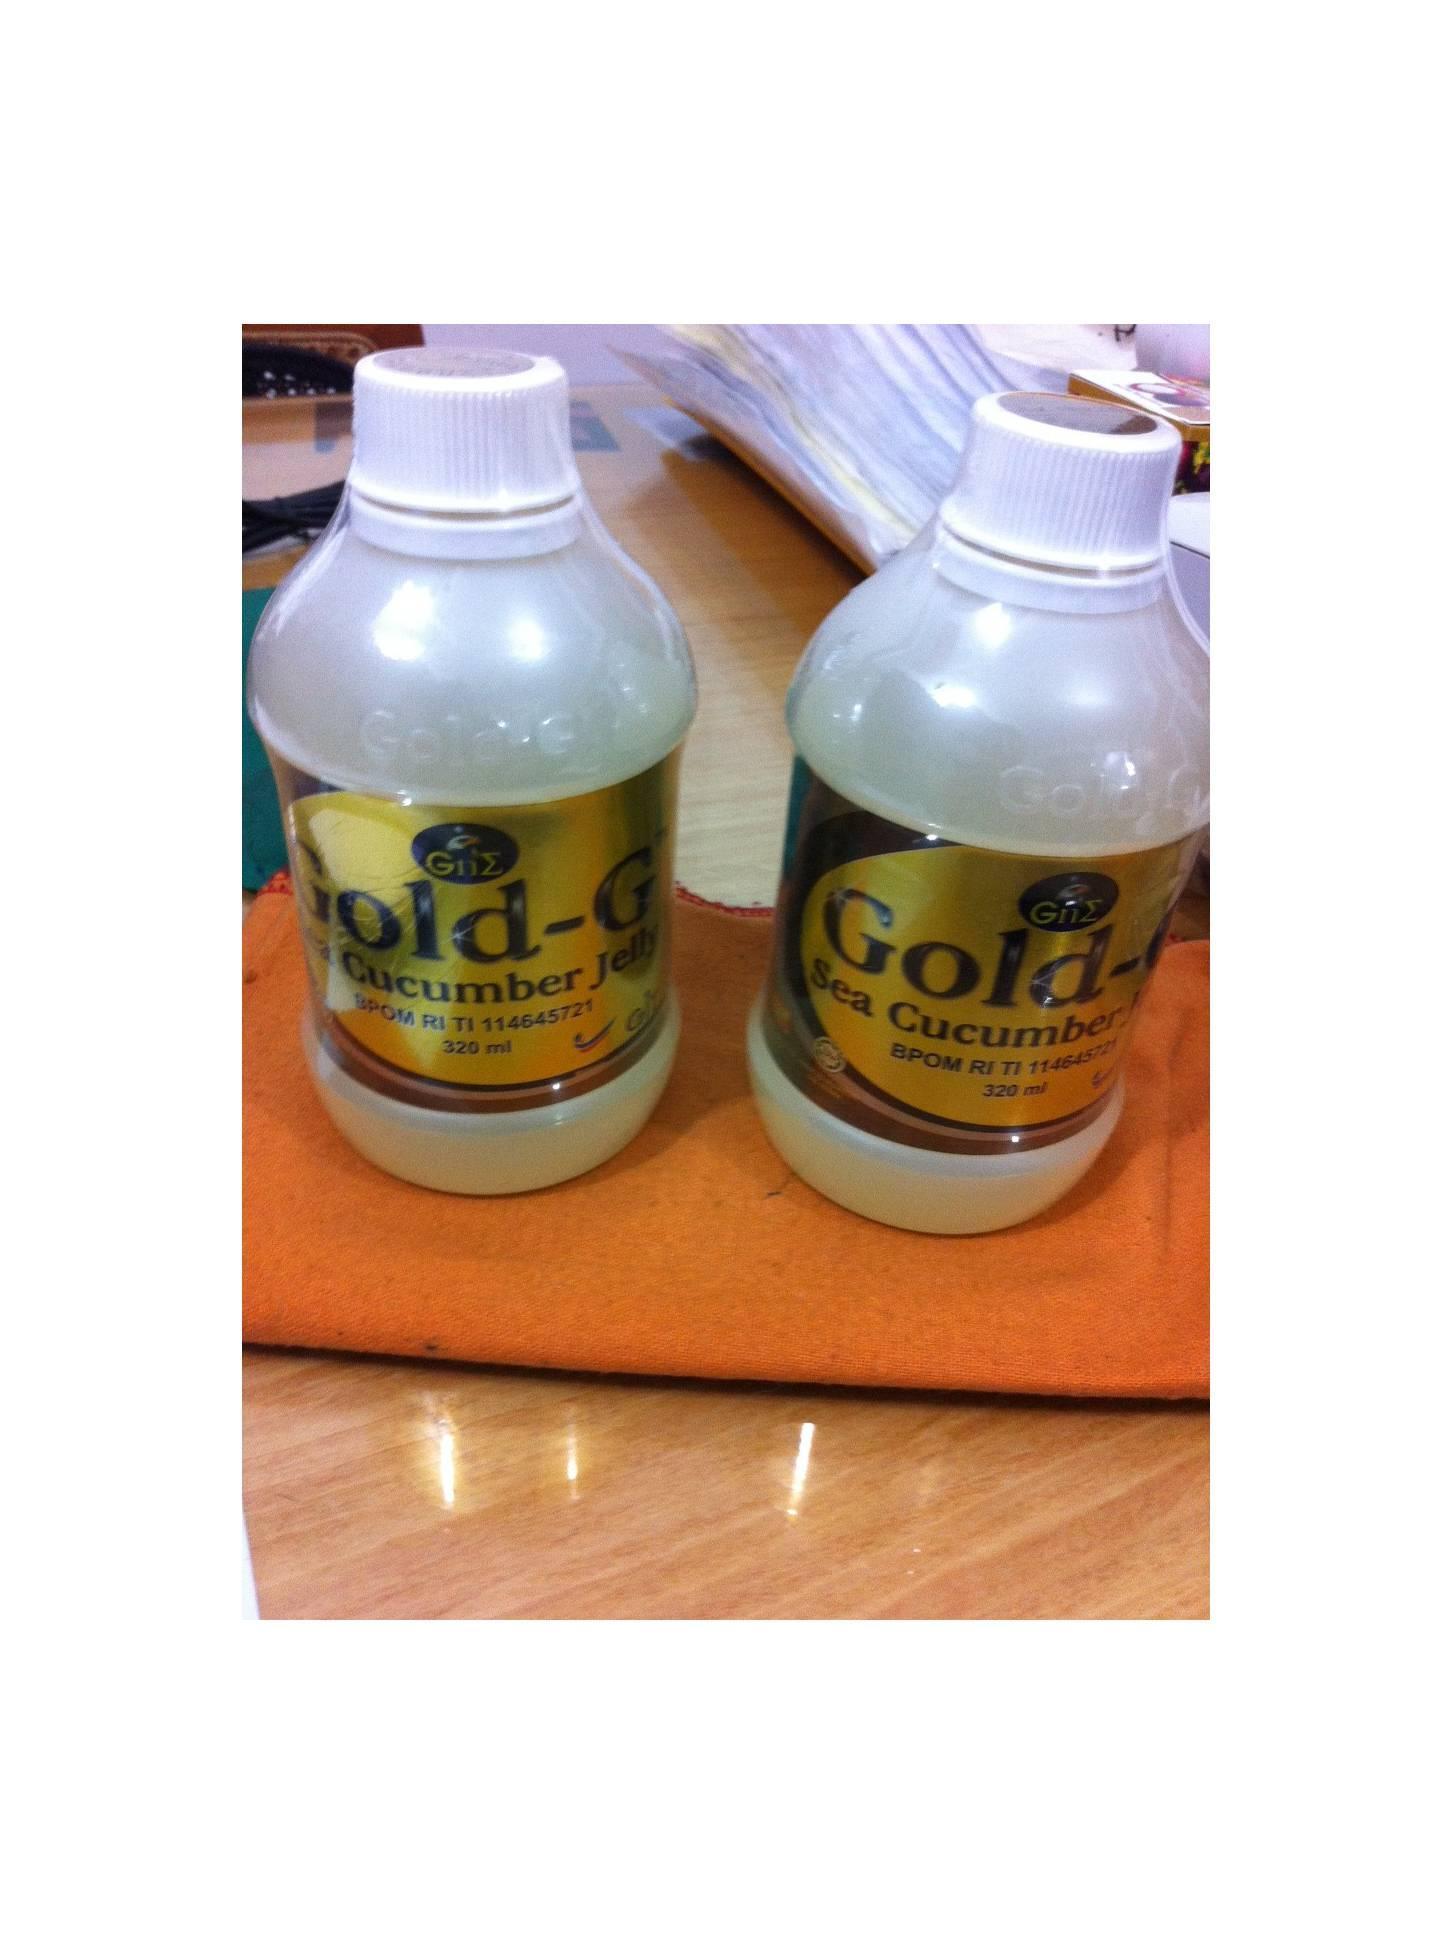 Promo Harga Jelly Gamat Gold G Sea Cucumber 320 Ml Termurah 2018 New Vario 110 Esp Cbs Estilo Black Kudus List Juli Review Gne 1